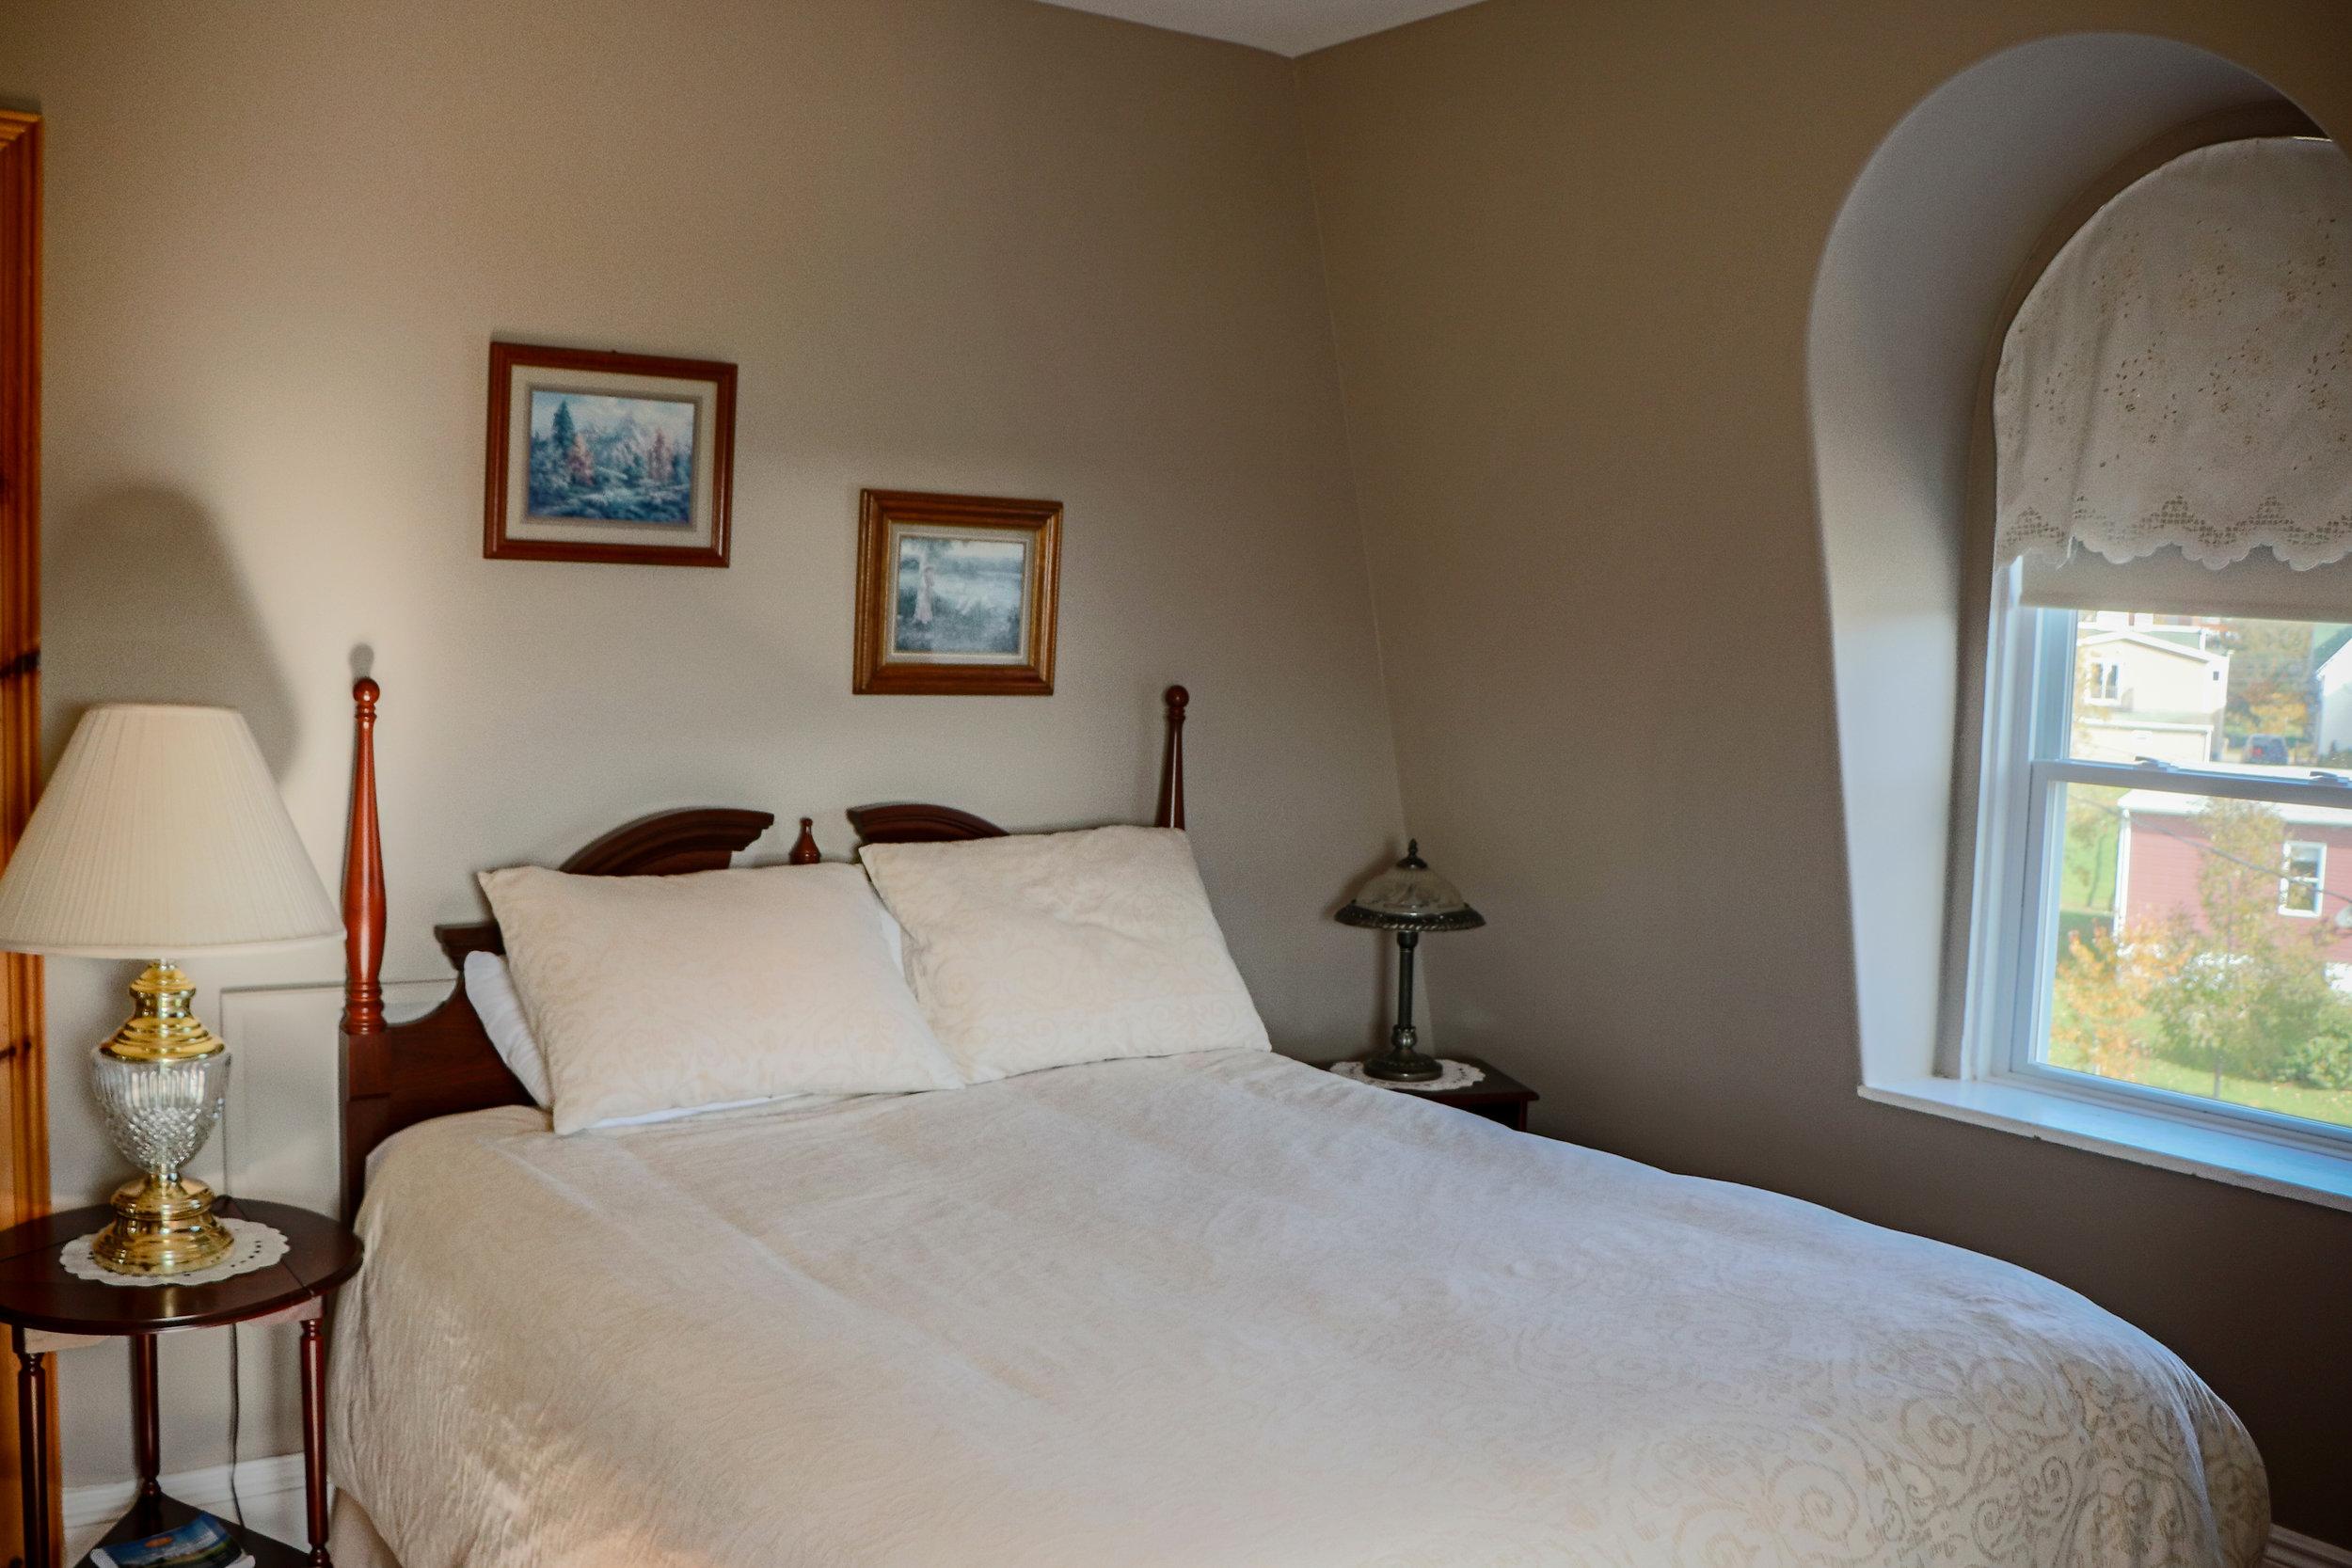 302 Little Harbour Suite - Price $172.50/Night